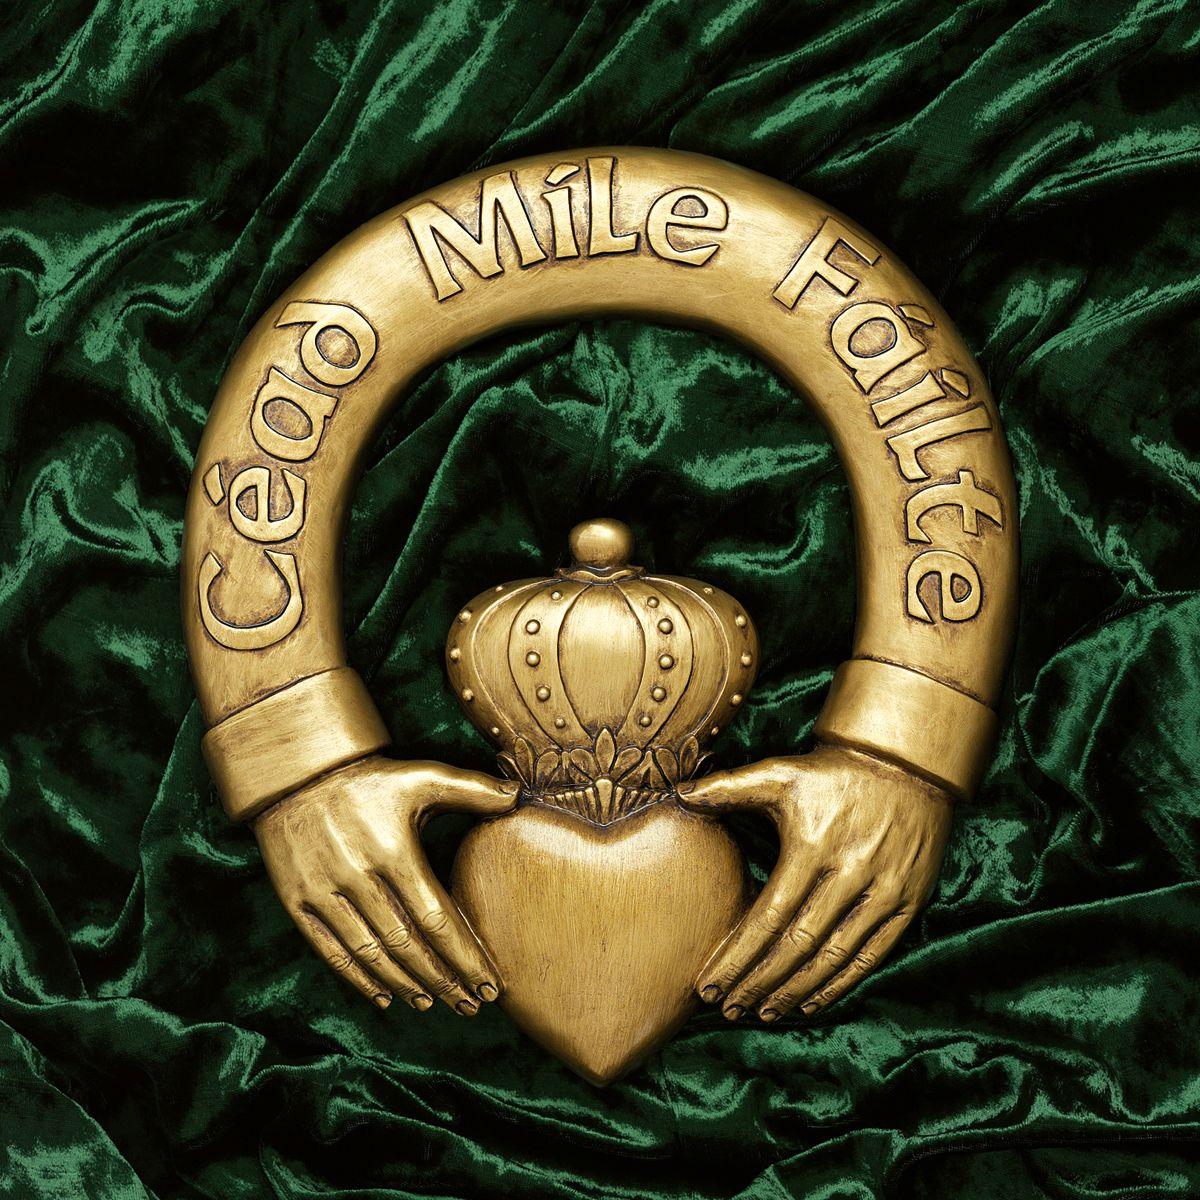 Céad míle fáilte translation a hundred thousand welcomes caint